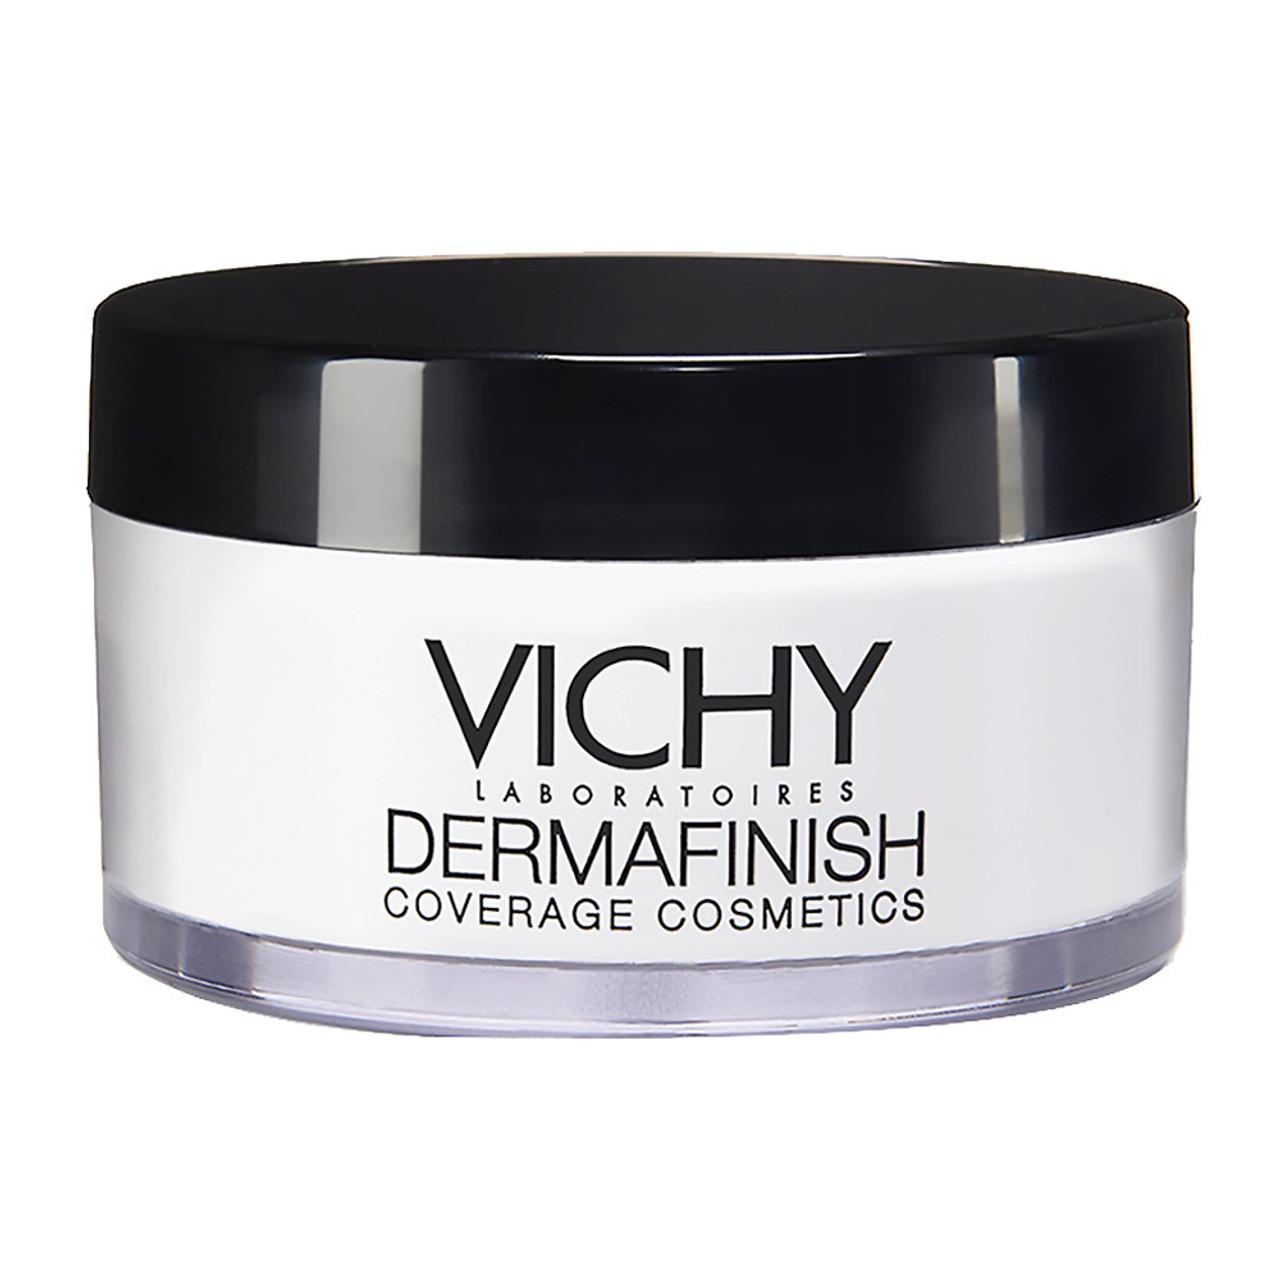 Vichy Dermafinish Setting Powder